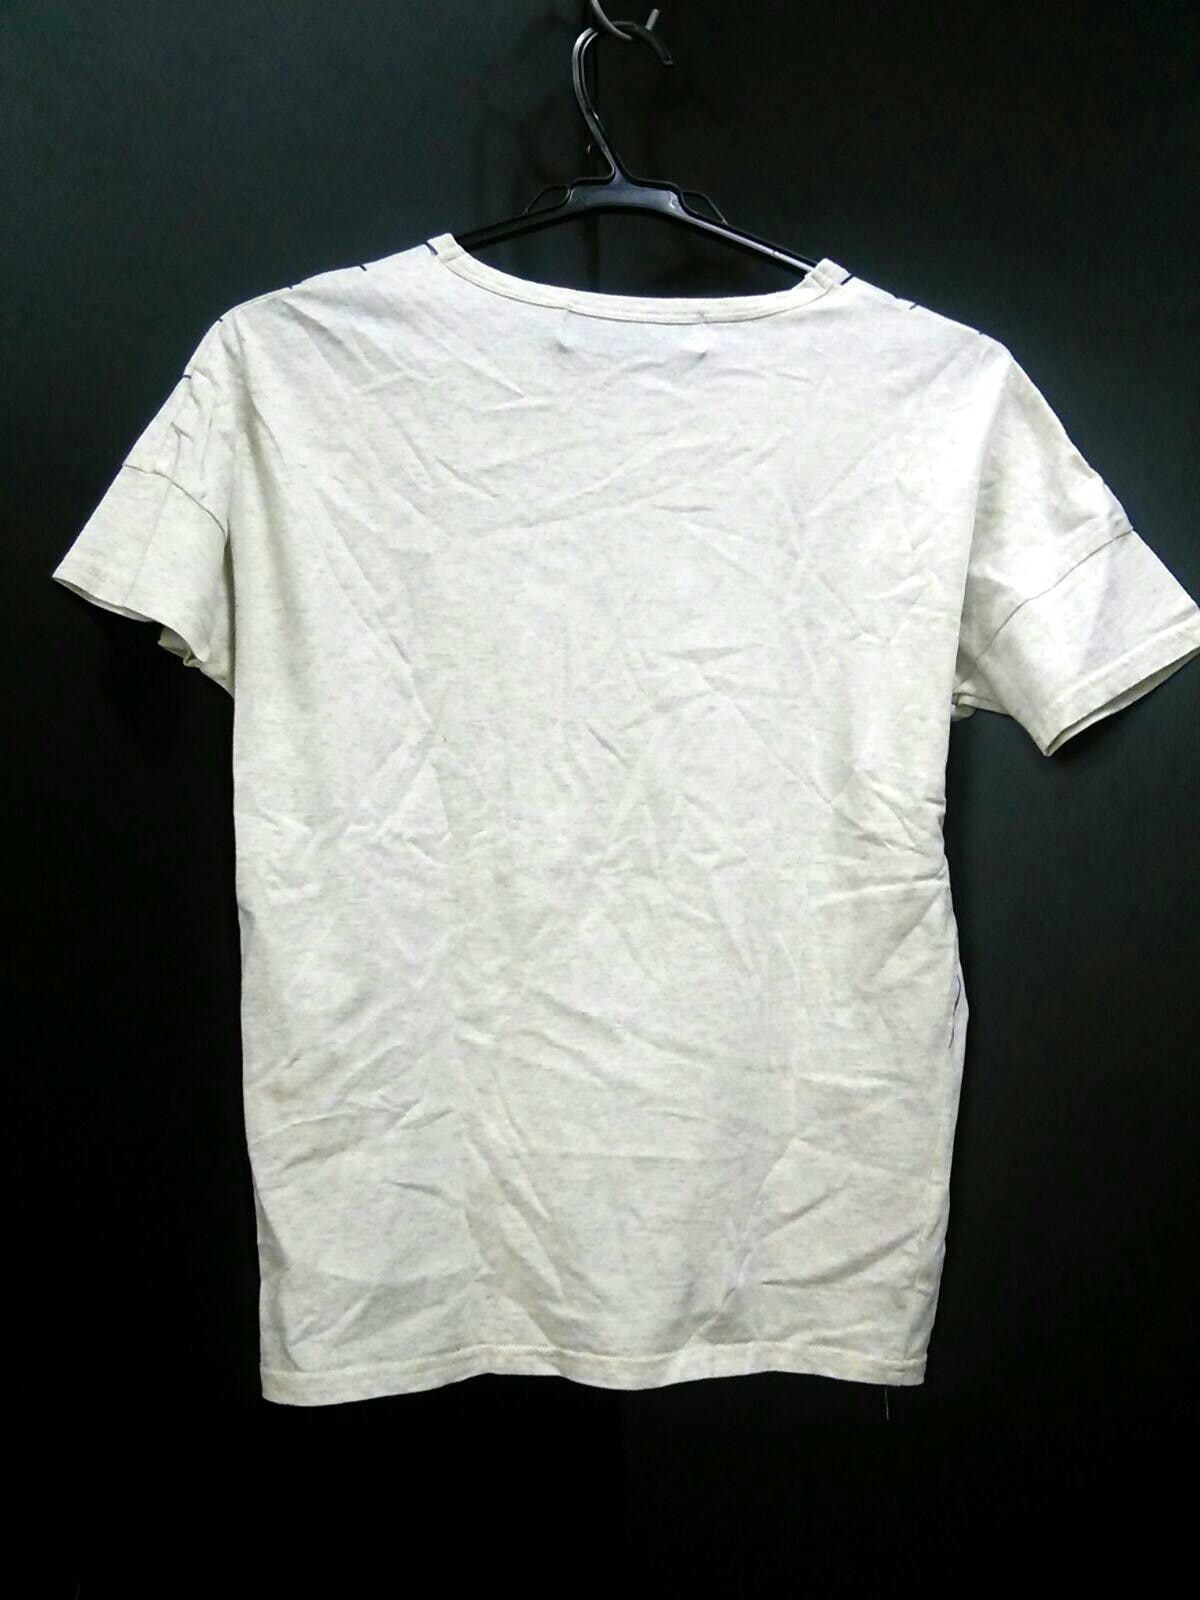 shortcutFORMARKS(ショートカットフォーマークス)のTシャツ